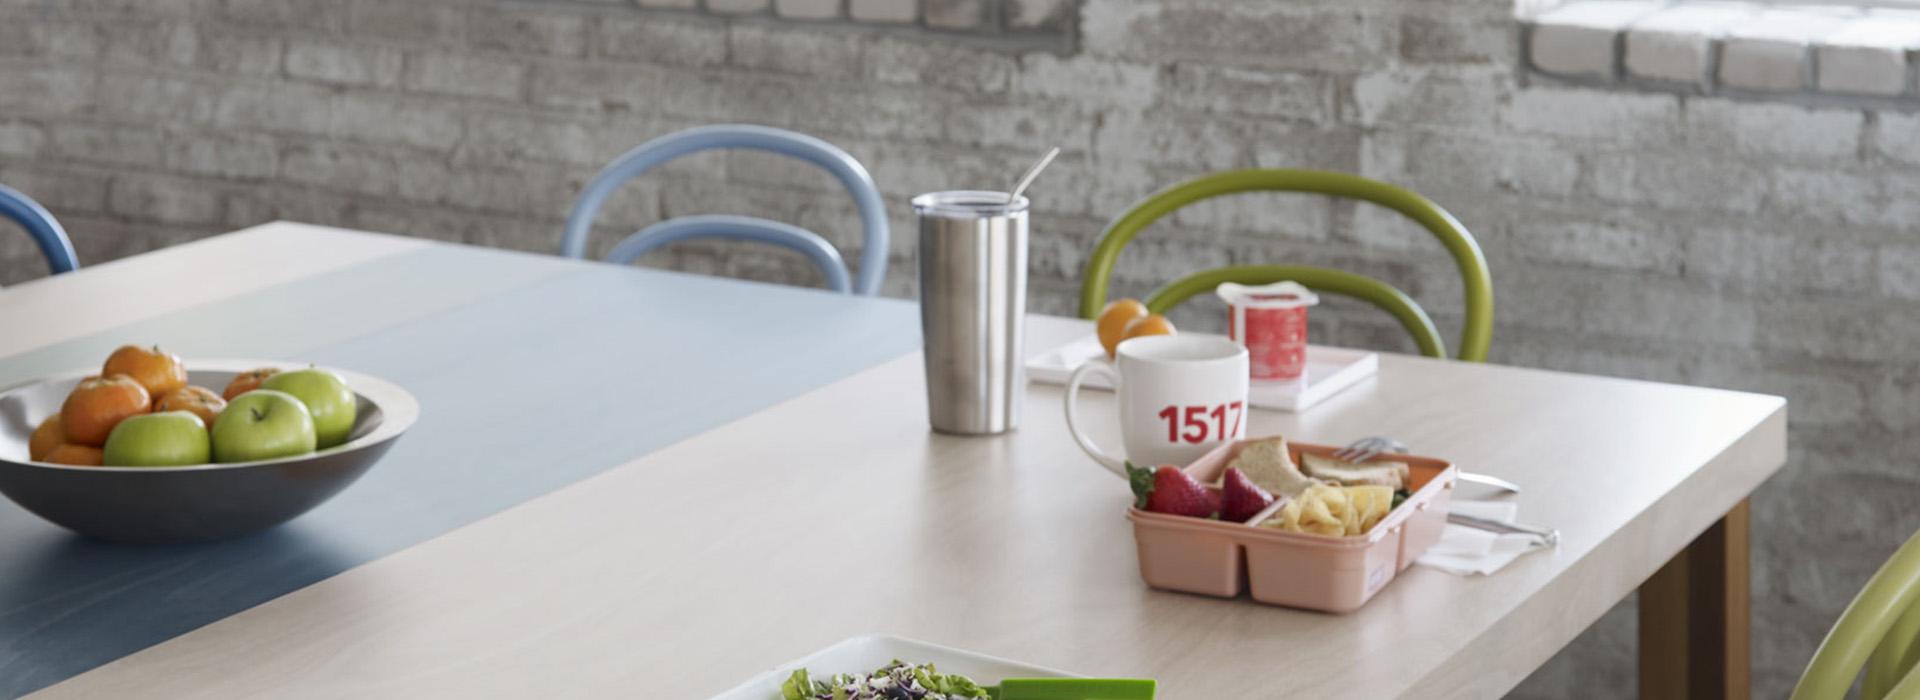 Breakfast bar 8912 Laminate